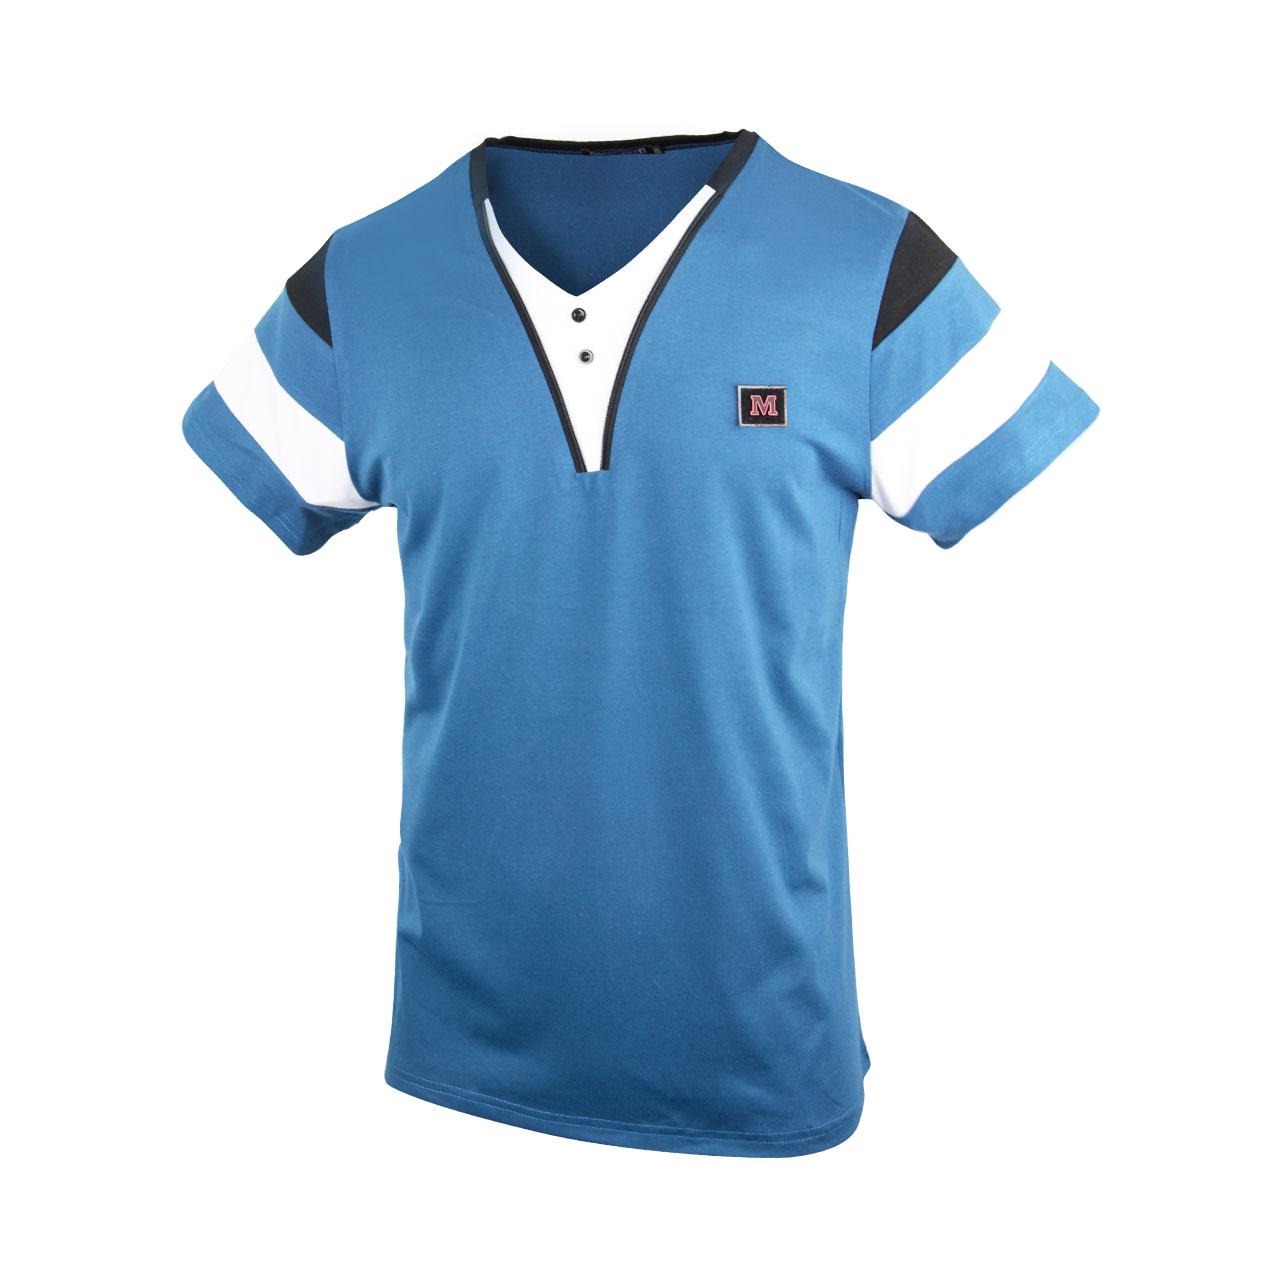 Men's Stylish Short Sleeve T-Shirt - White/Blue/Green